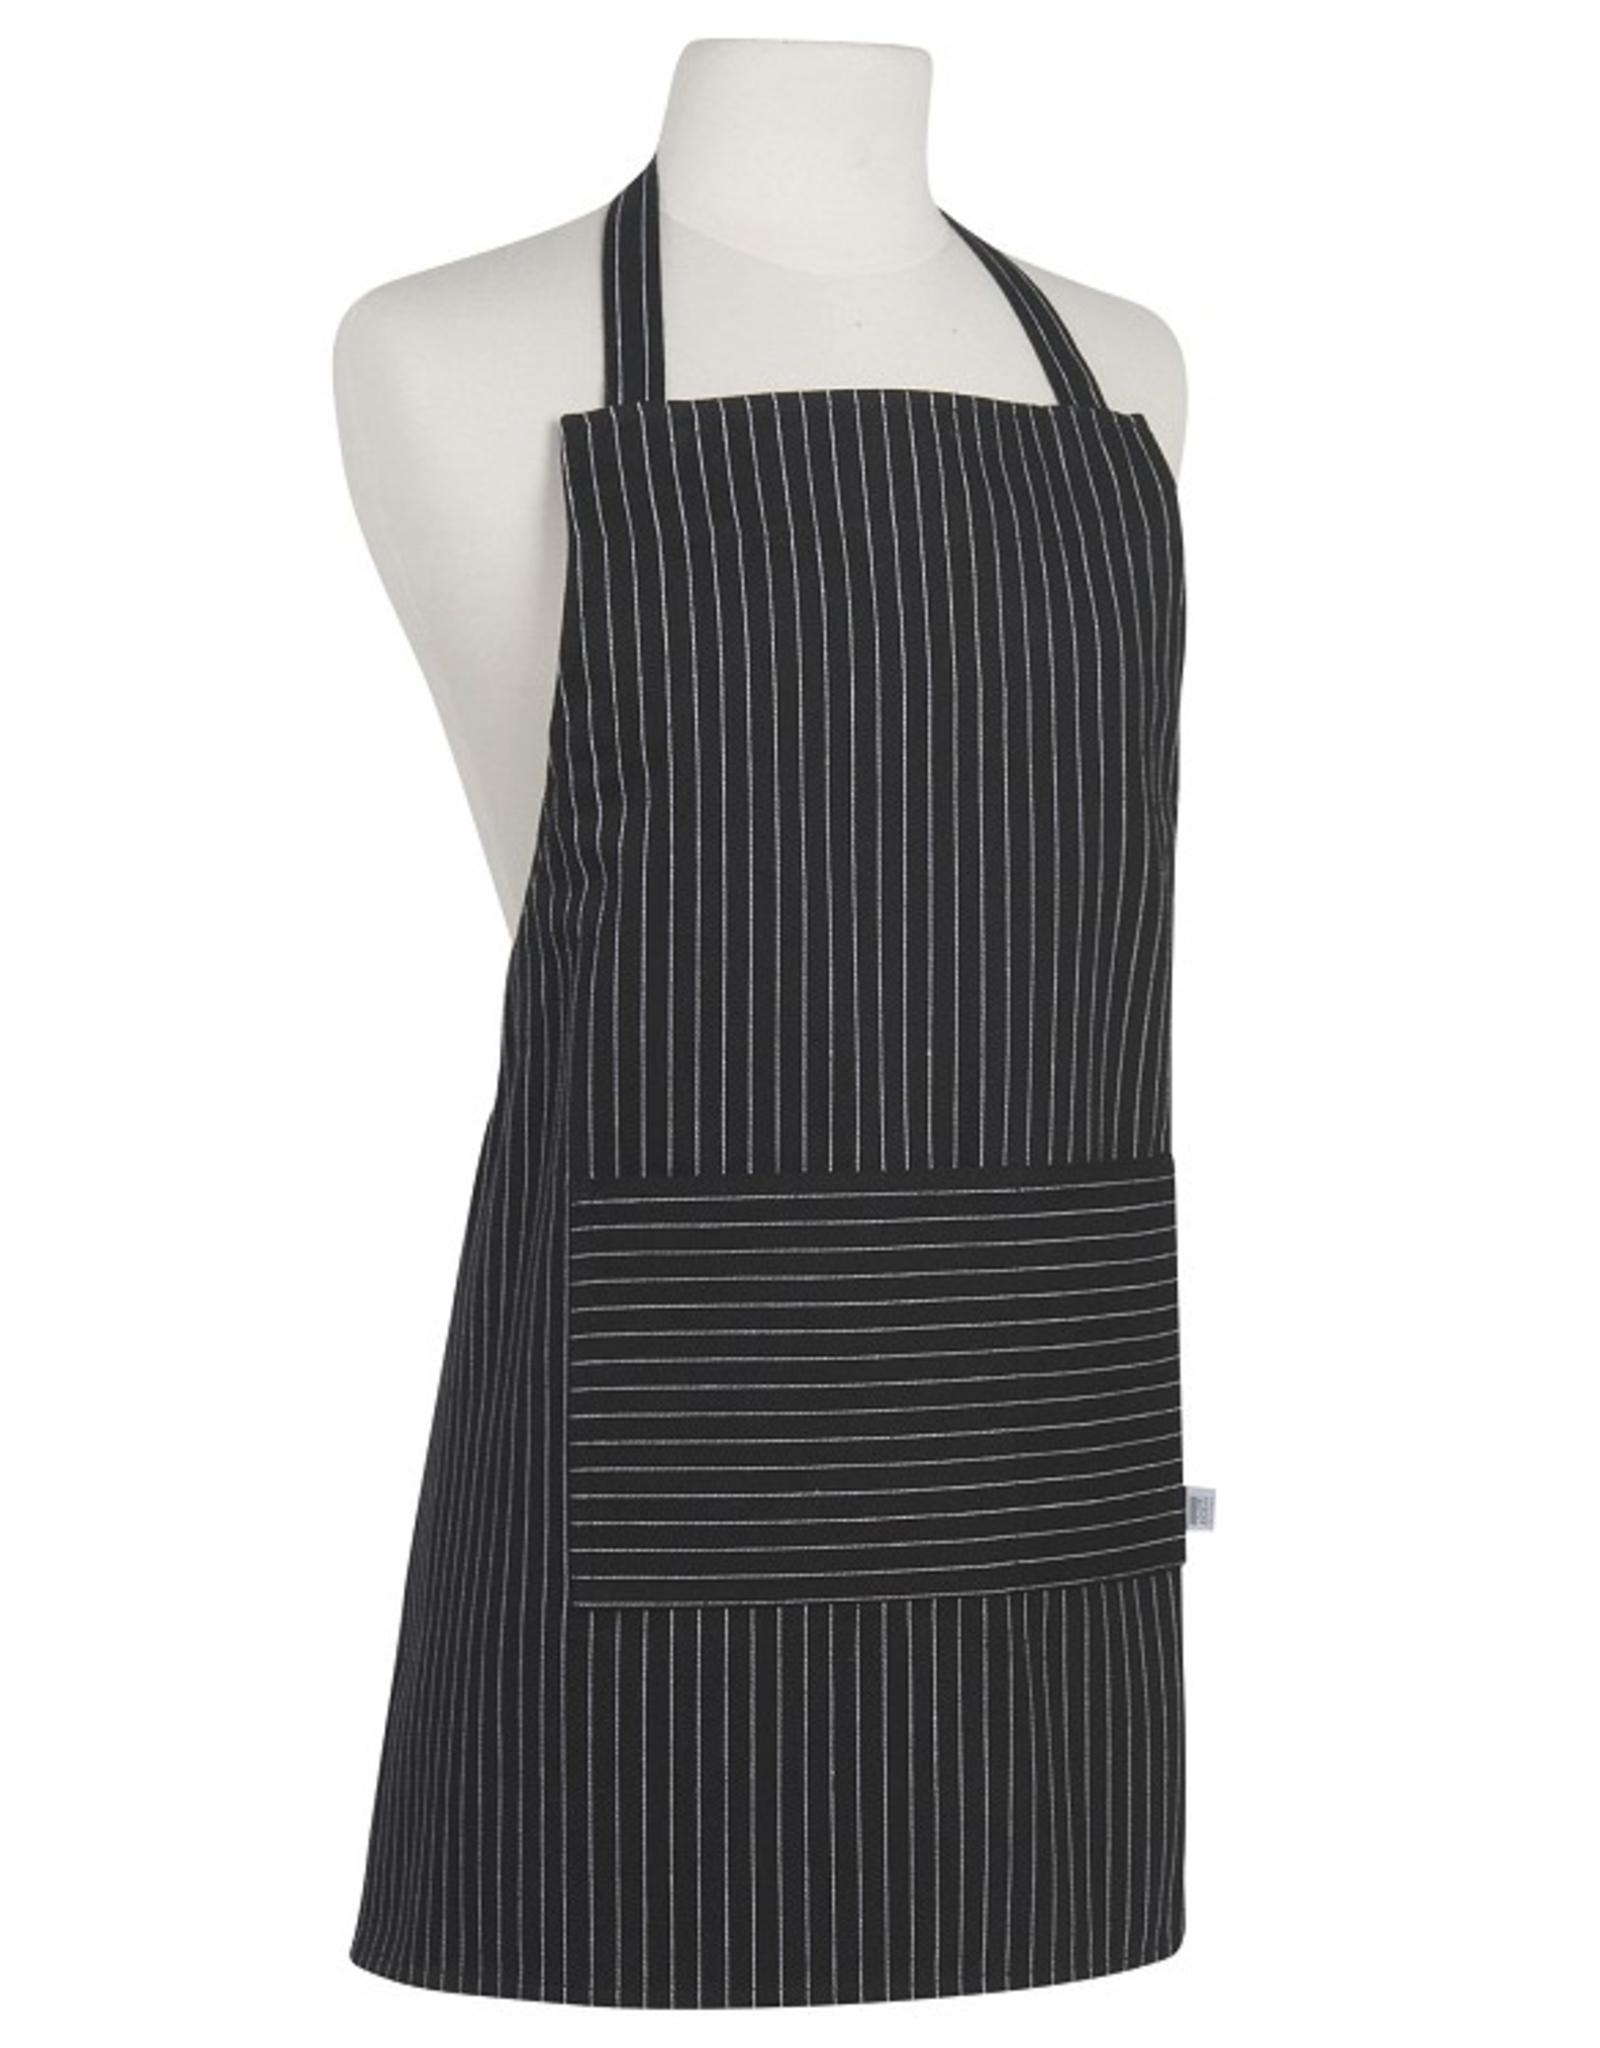 Now Designs Kids Cooking Apron, Black Pinstripe